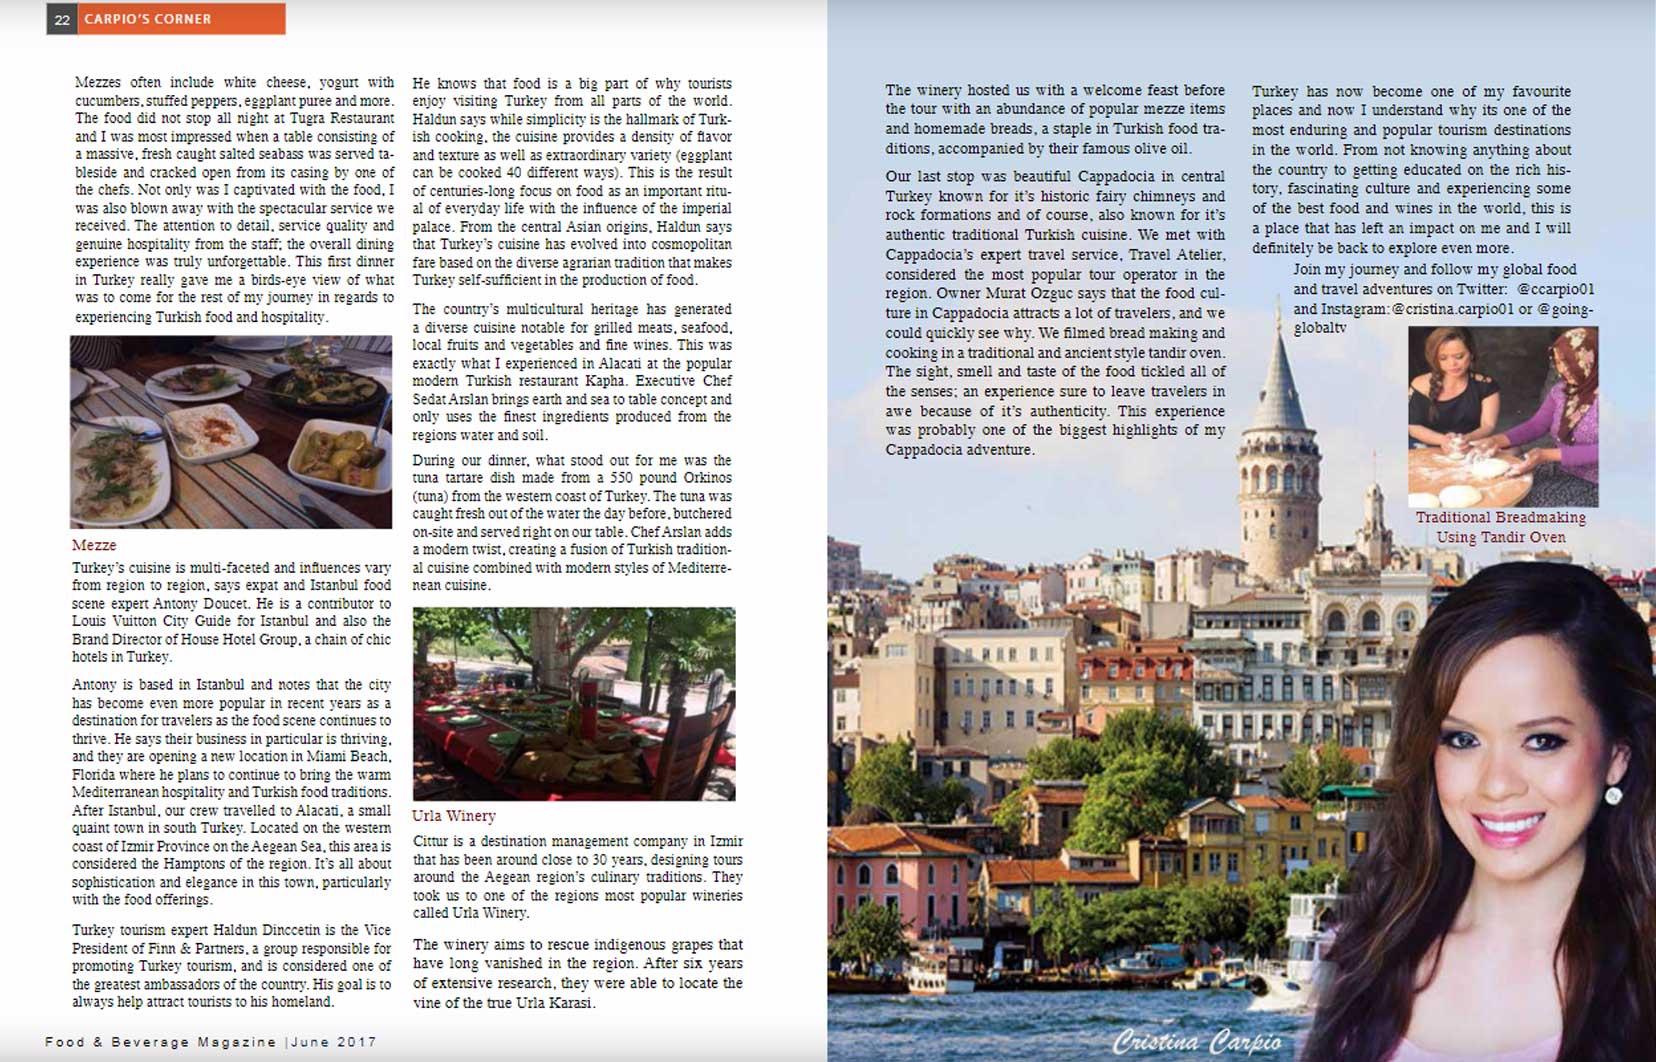 Food & Beverage Magazine June 2017 East Meet West, Cristina Carpio by Going Global TV Cover Cappadocia